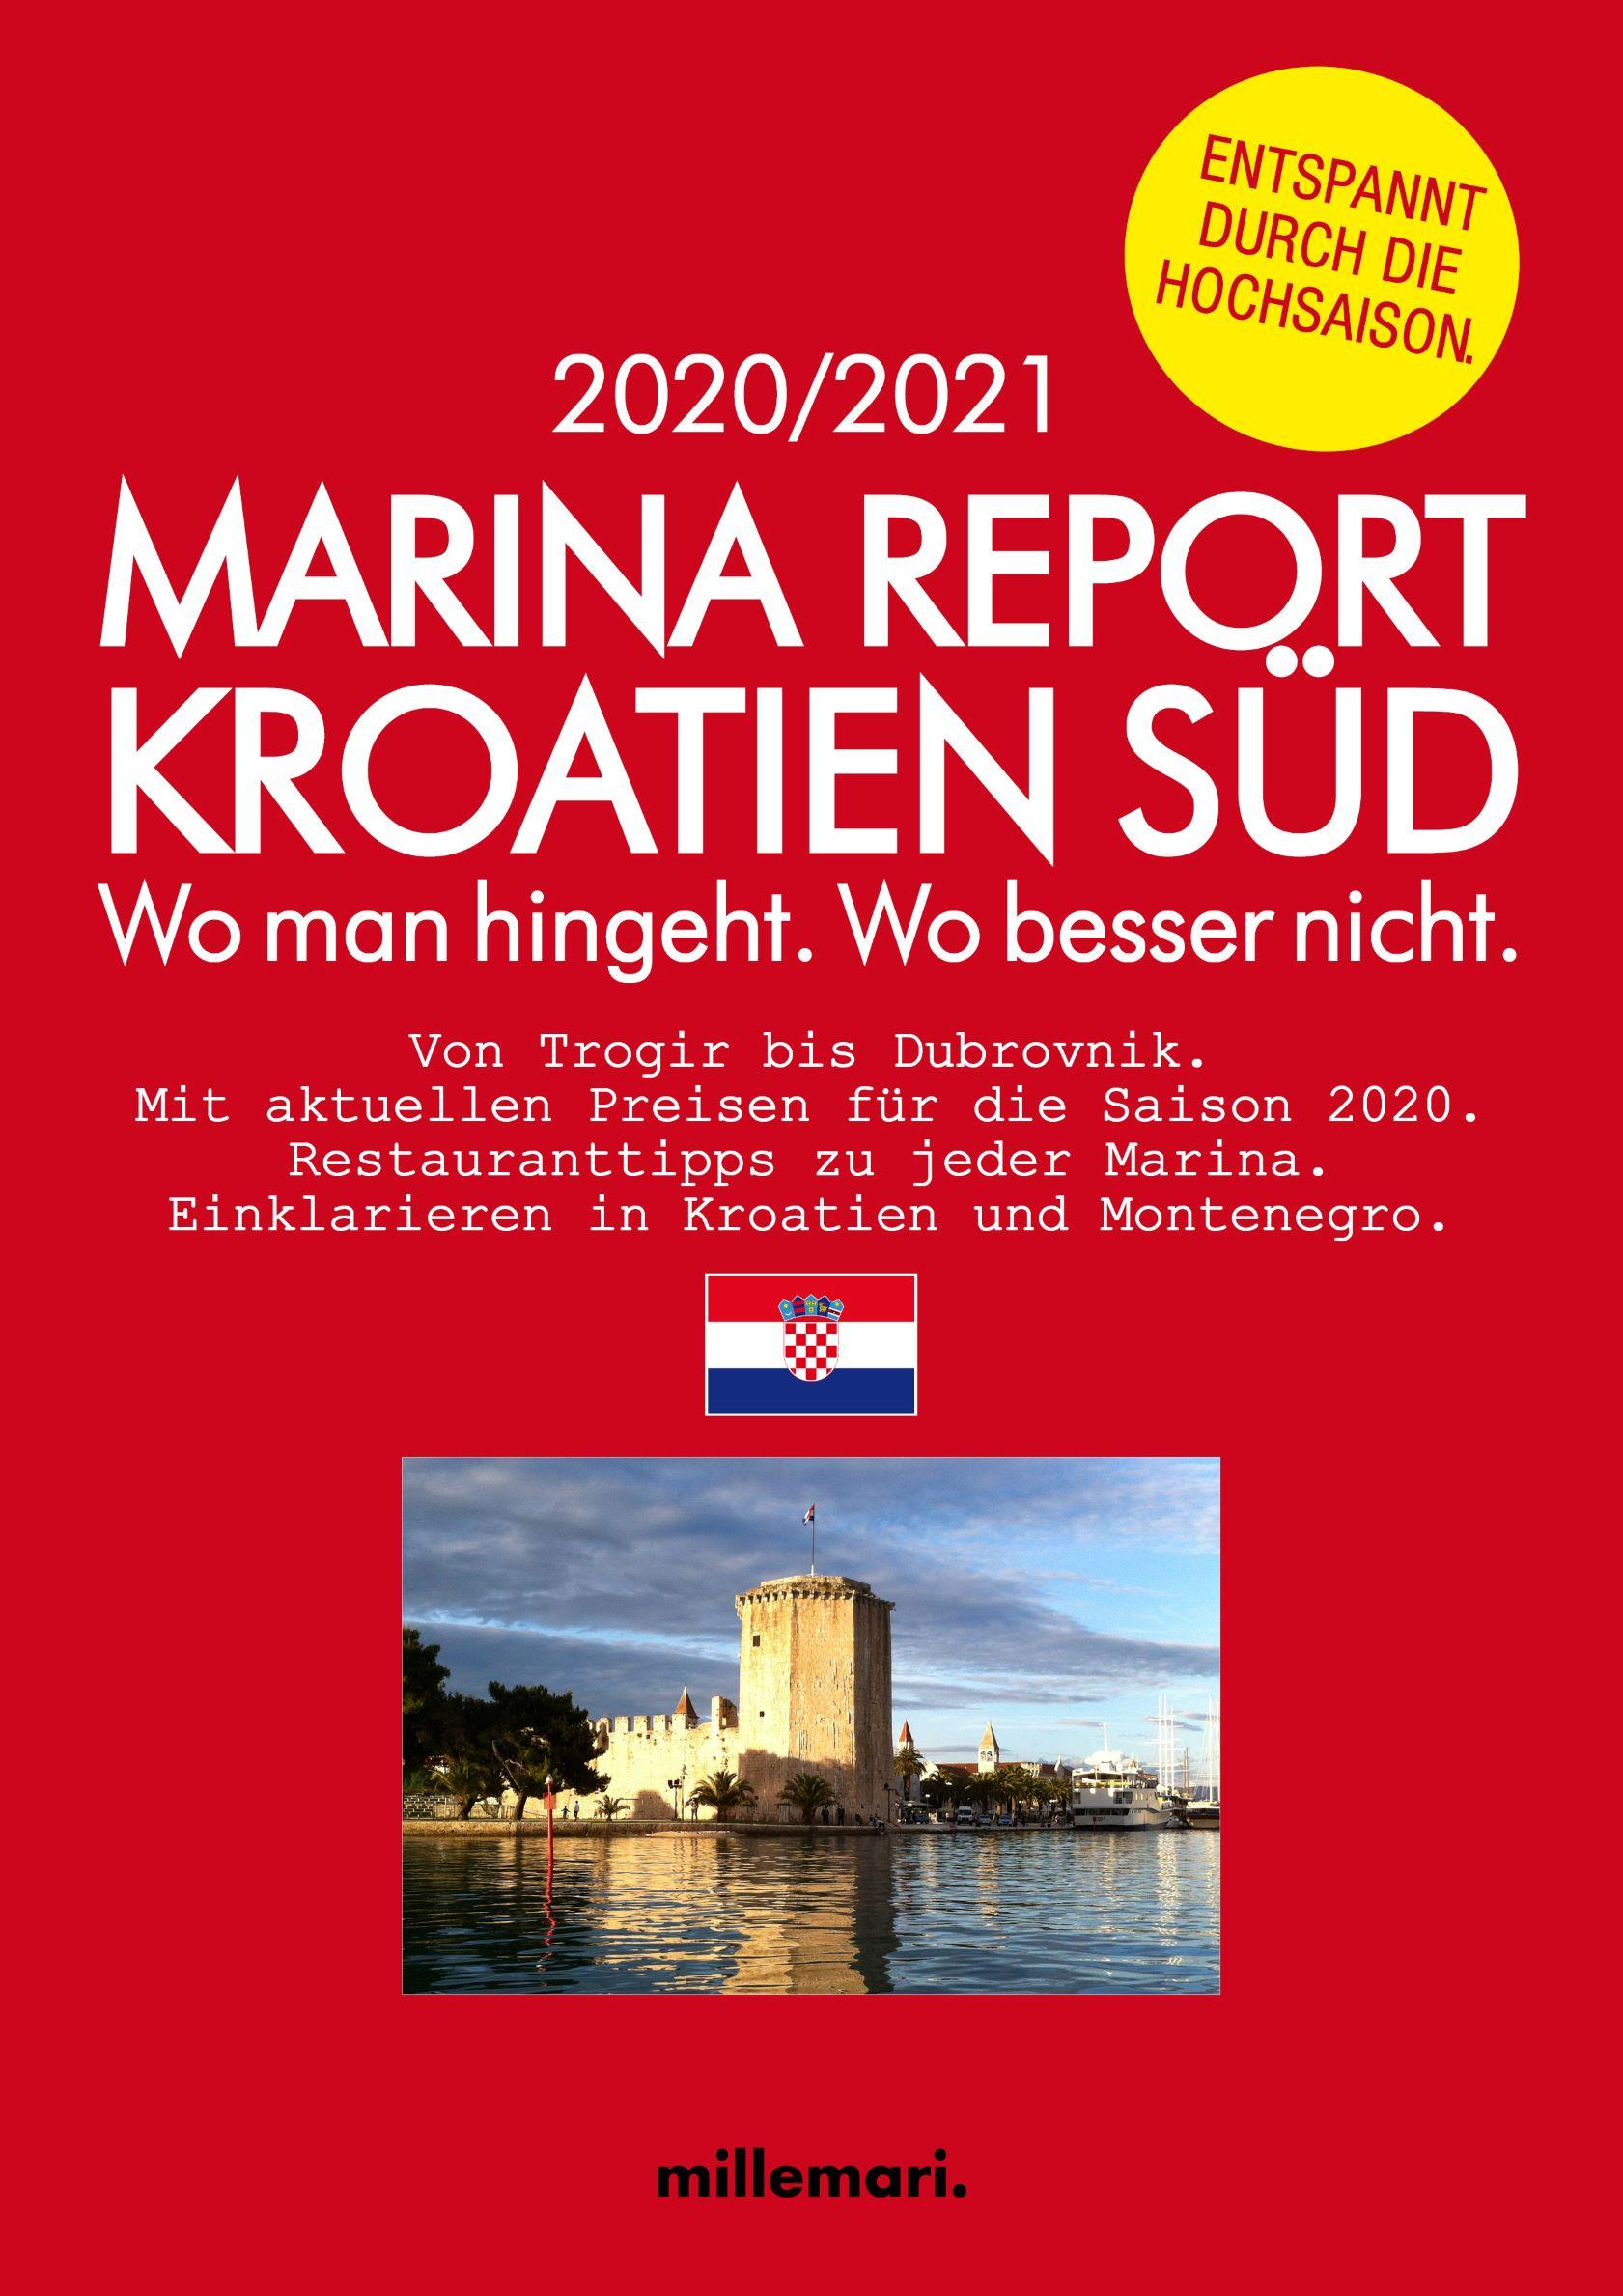 Marina Report Kroatien Süd